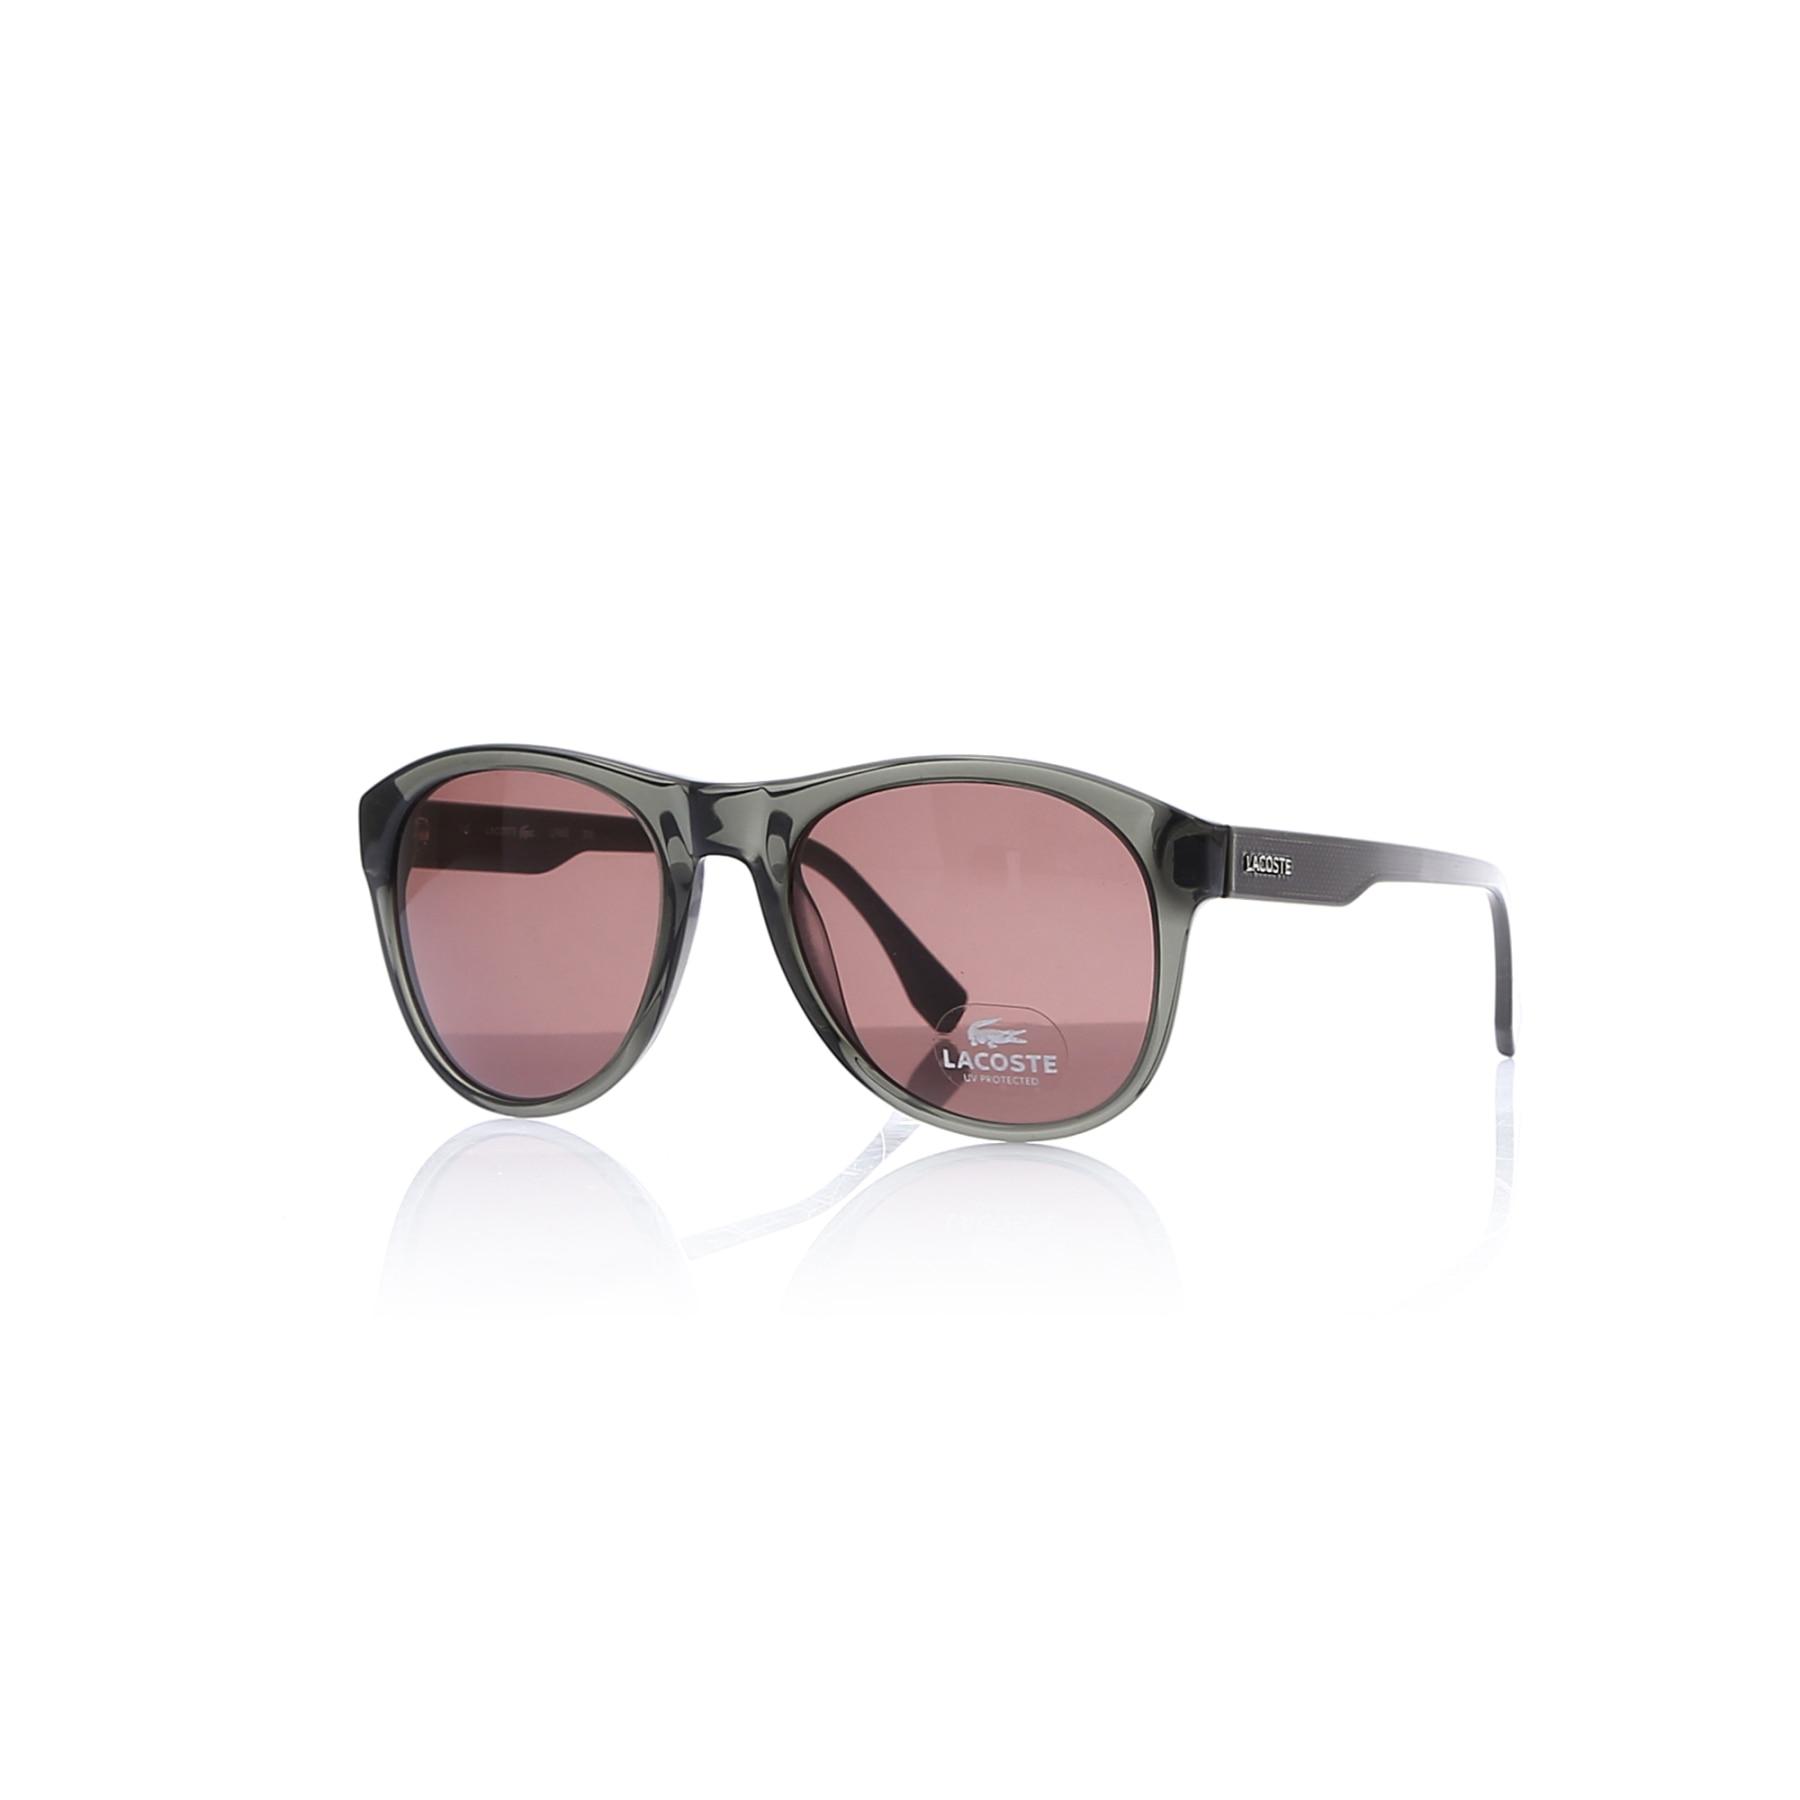 Gafas de sol para hombre lcc 746 315 hueso ahumado orgánico oval aval 58-20-145 lacoste